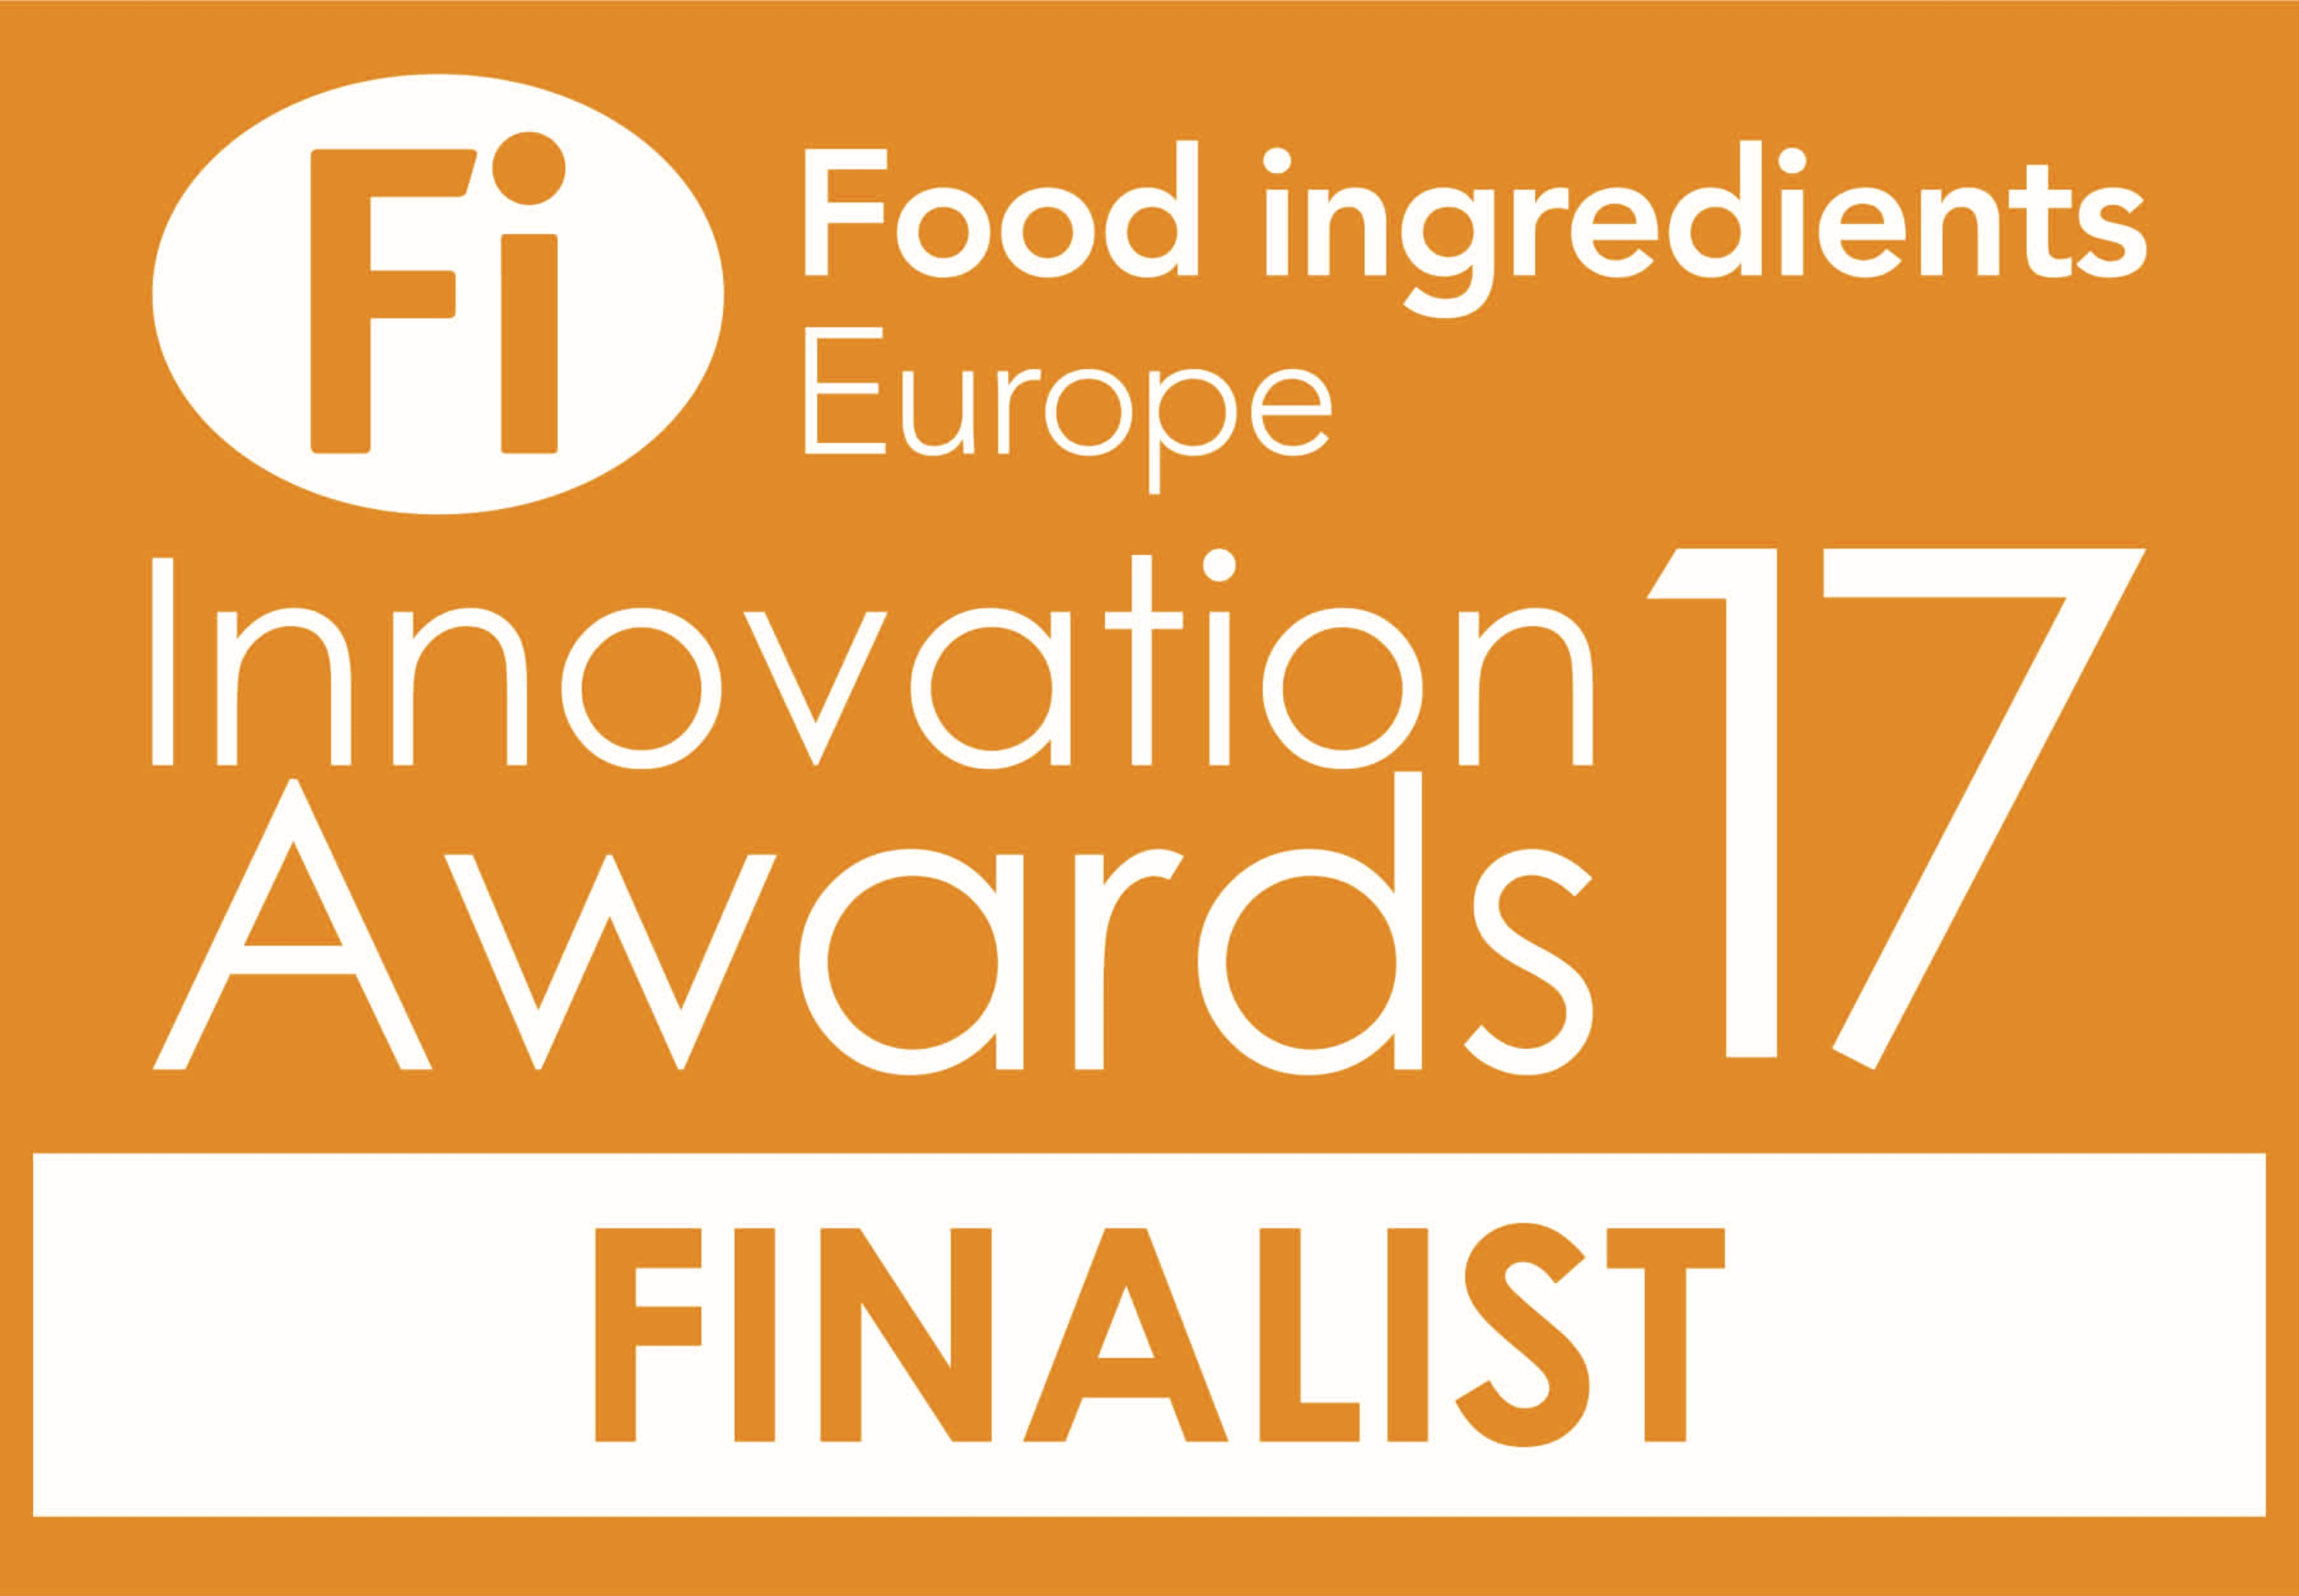 fi-europe-innovatinons-award